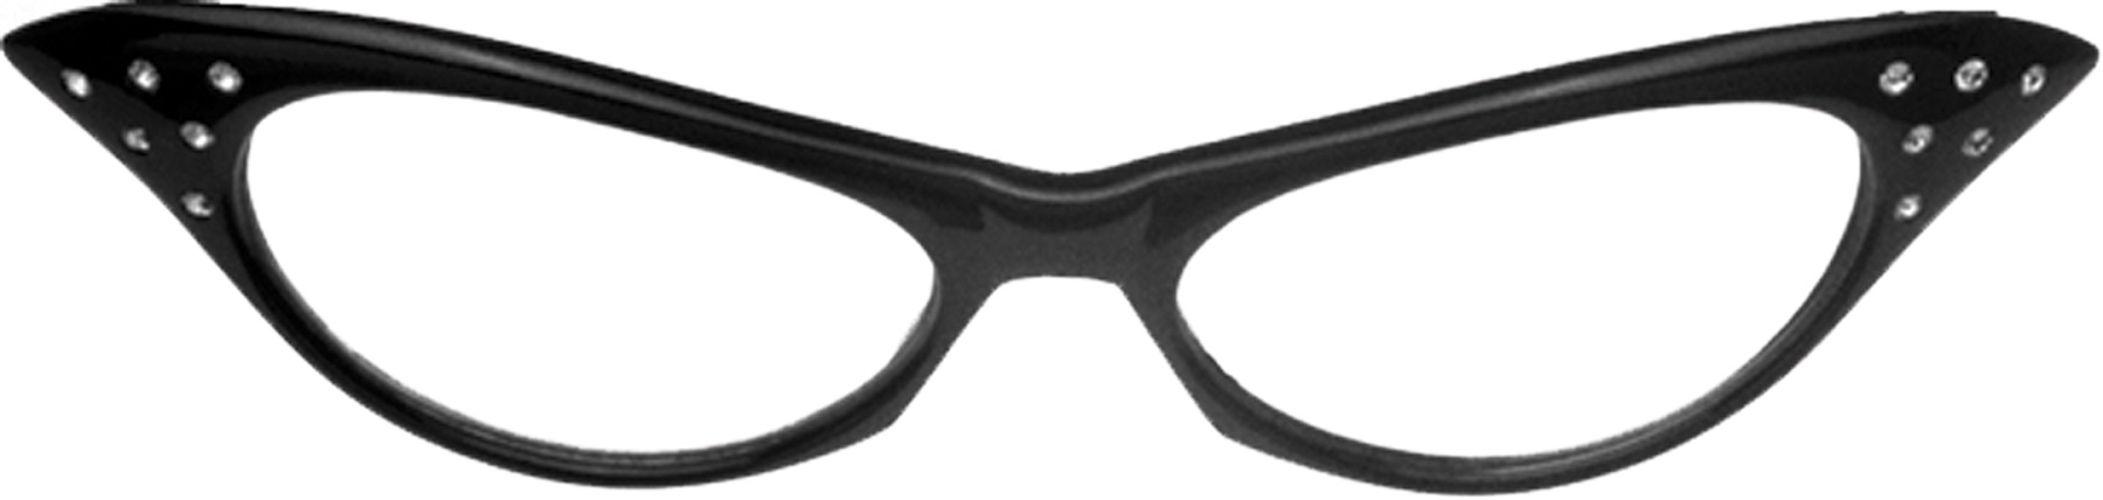 GLASSES 50'S RHINESTONE BK CLR